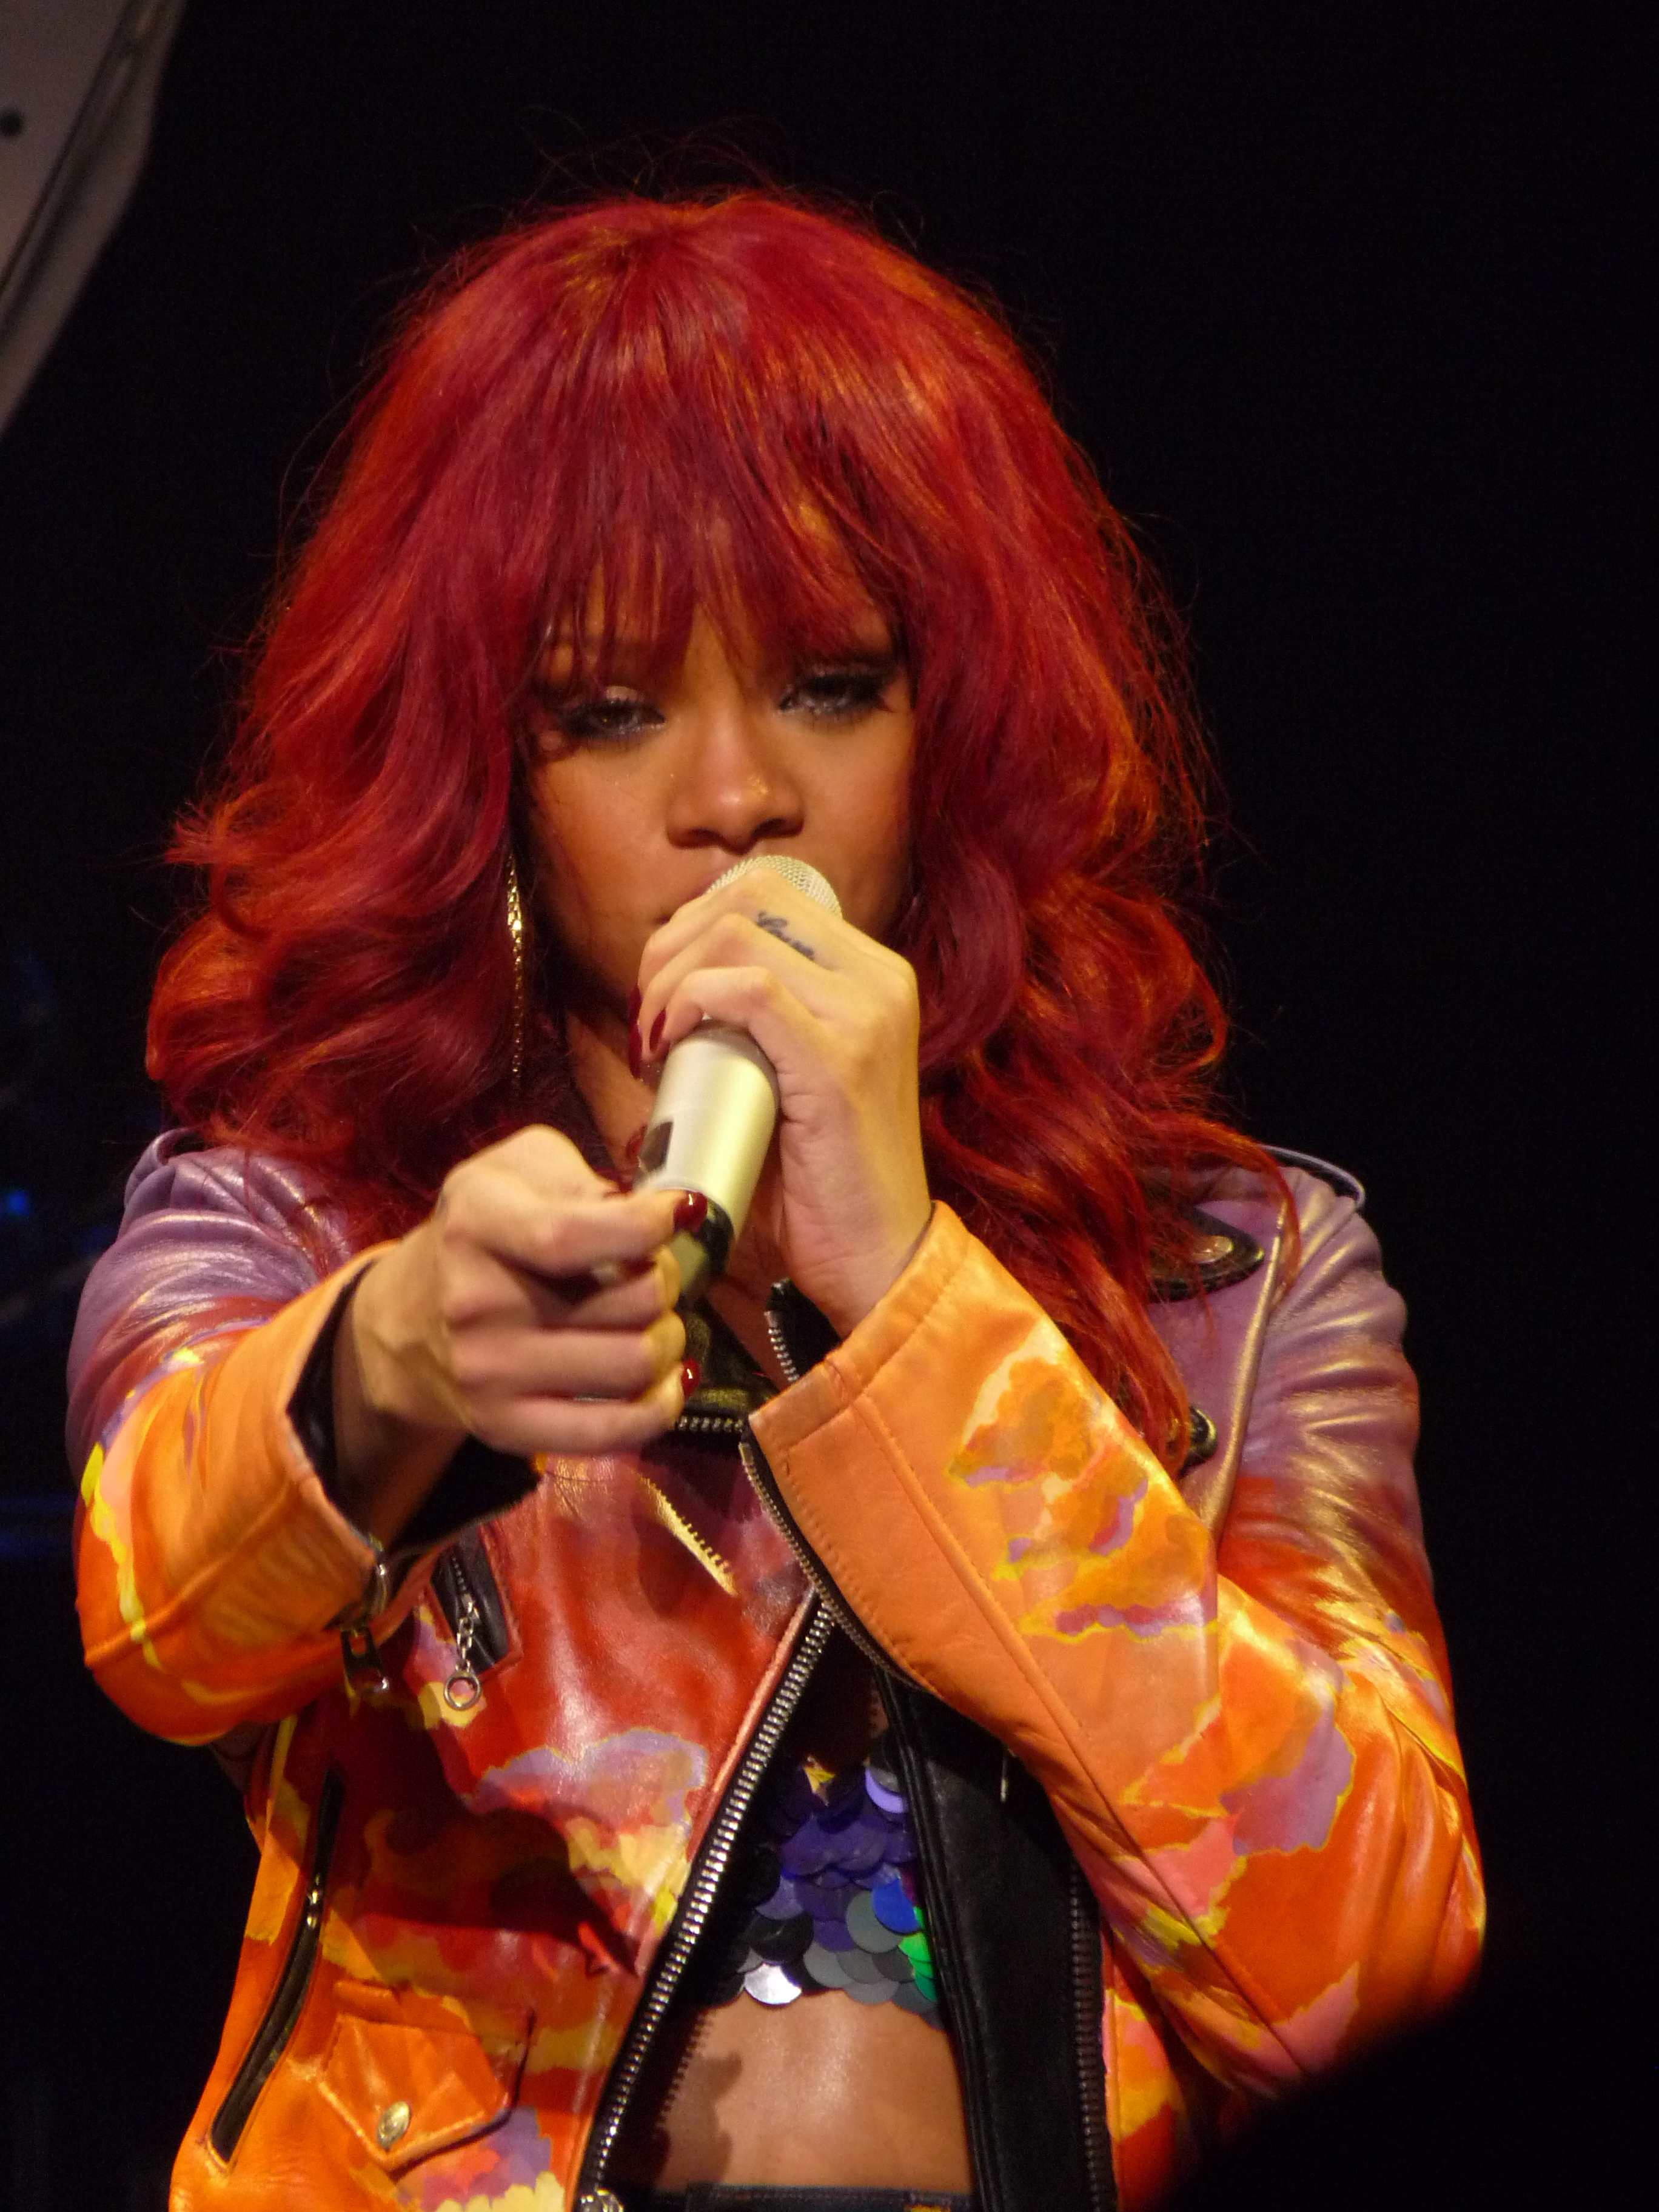 Rihanna work live 3 with drake 4